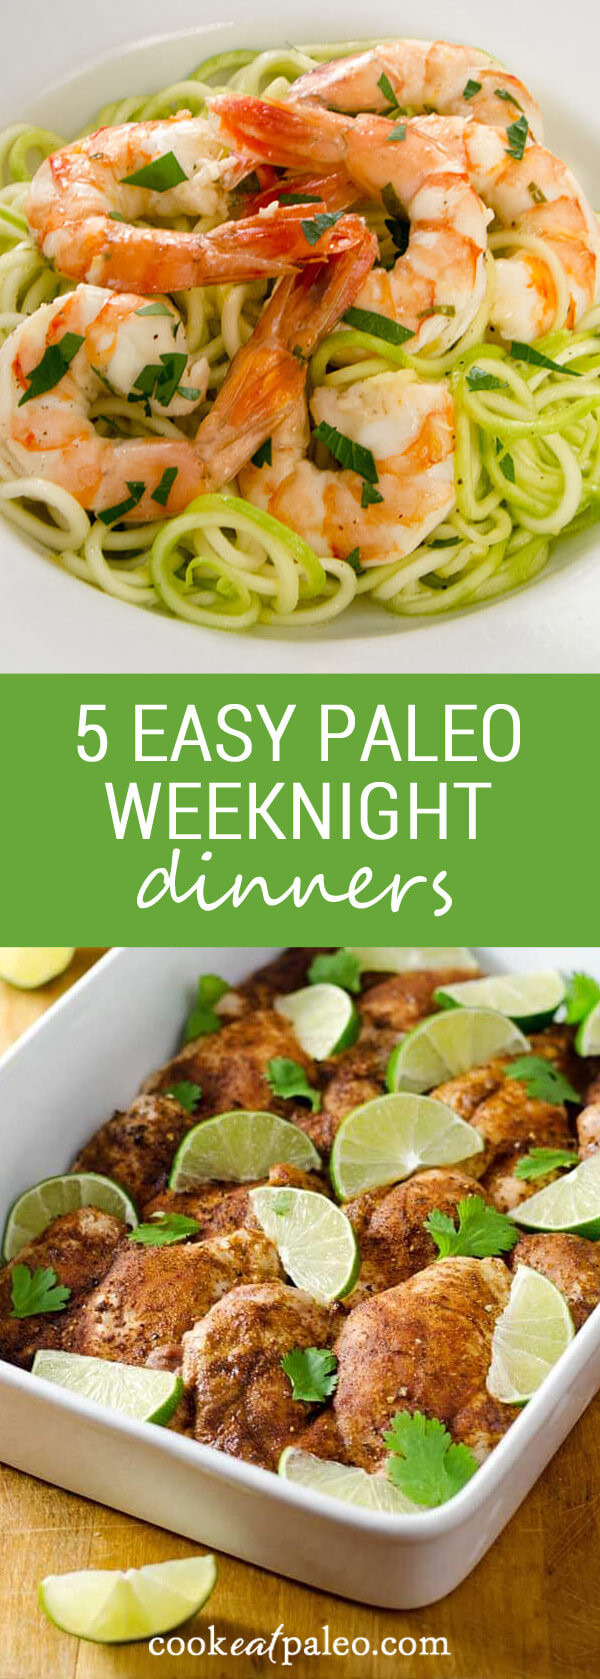 Easy Paleo Dinner  5 Easy Paleo Weeknight Dinners